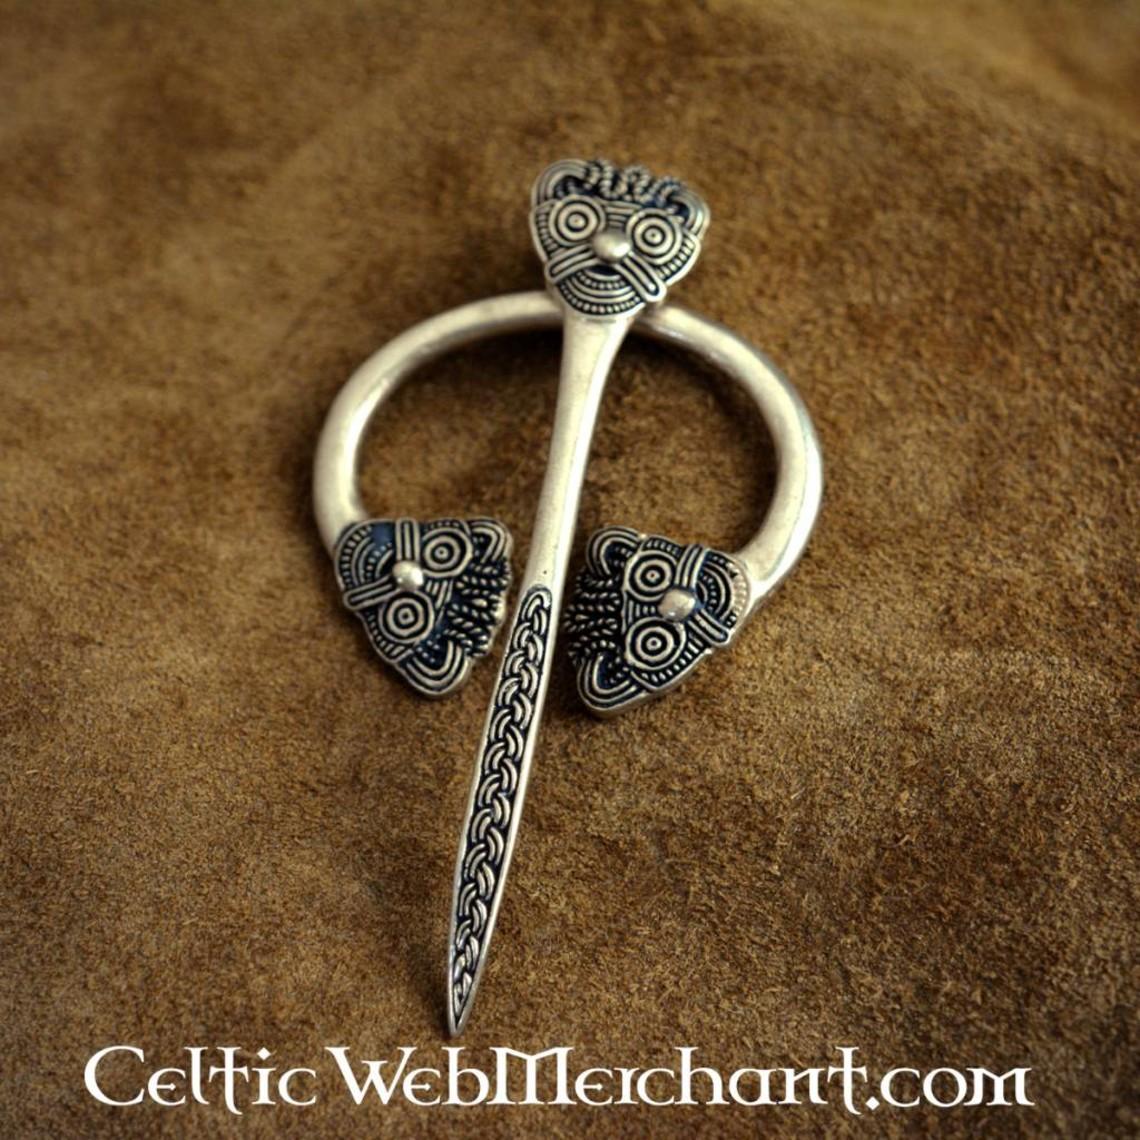 10. århundrede Viking fibula Høm